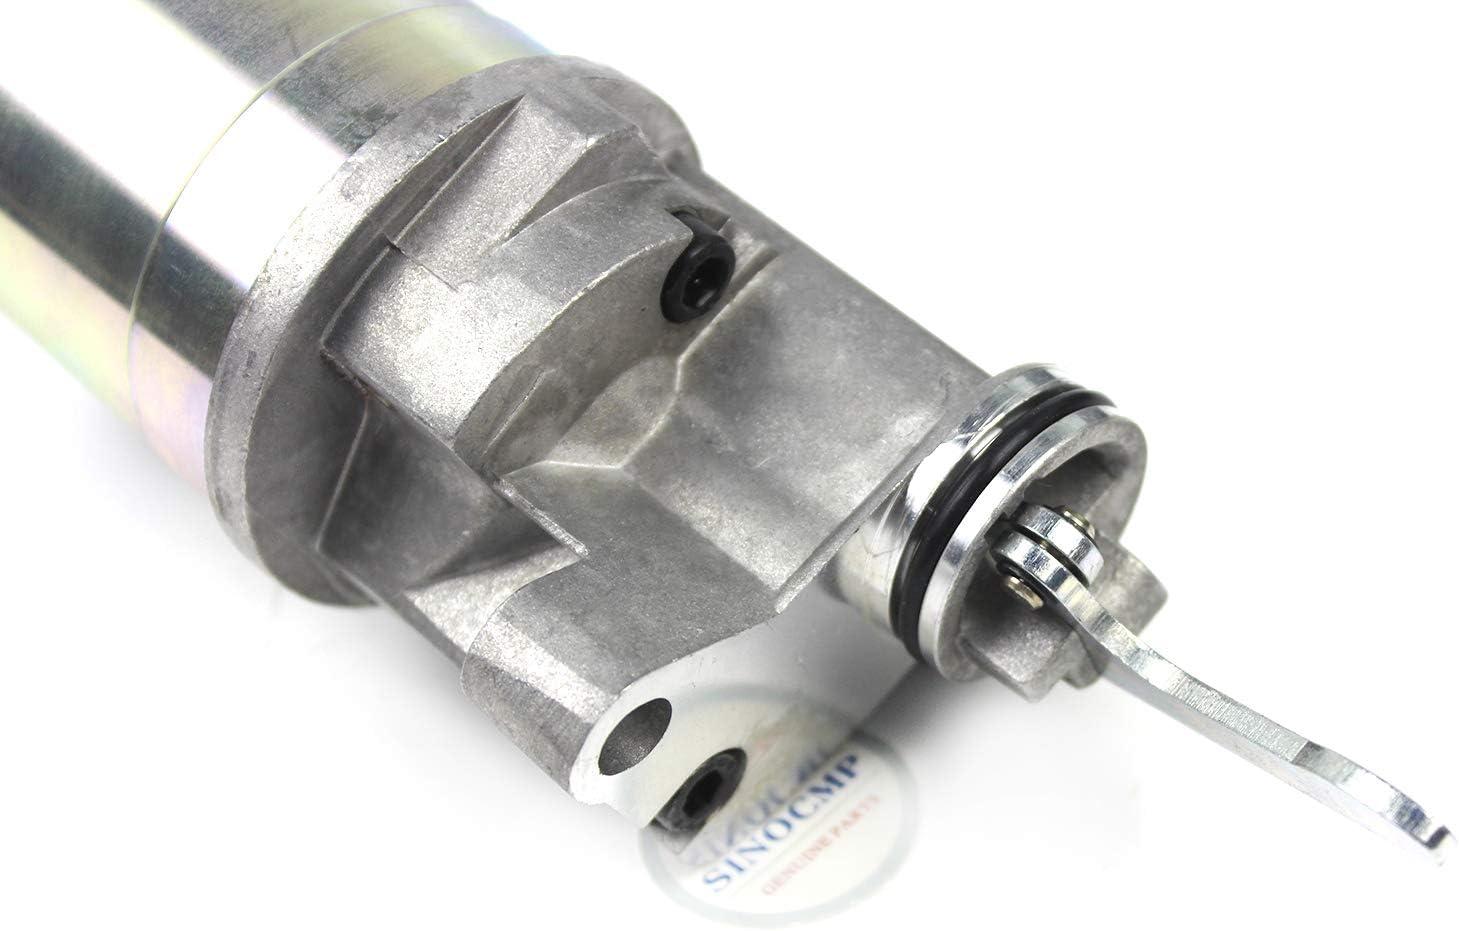 3/Meses /sinocmp cp-u0340/apagado solenoide para Deutz bf6/m2012/bf4/m2012 /3789/24/V combustible apagado solenoide/ /9904/0211/ 0419/ /9901/0419/